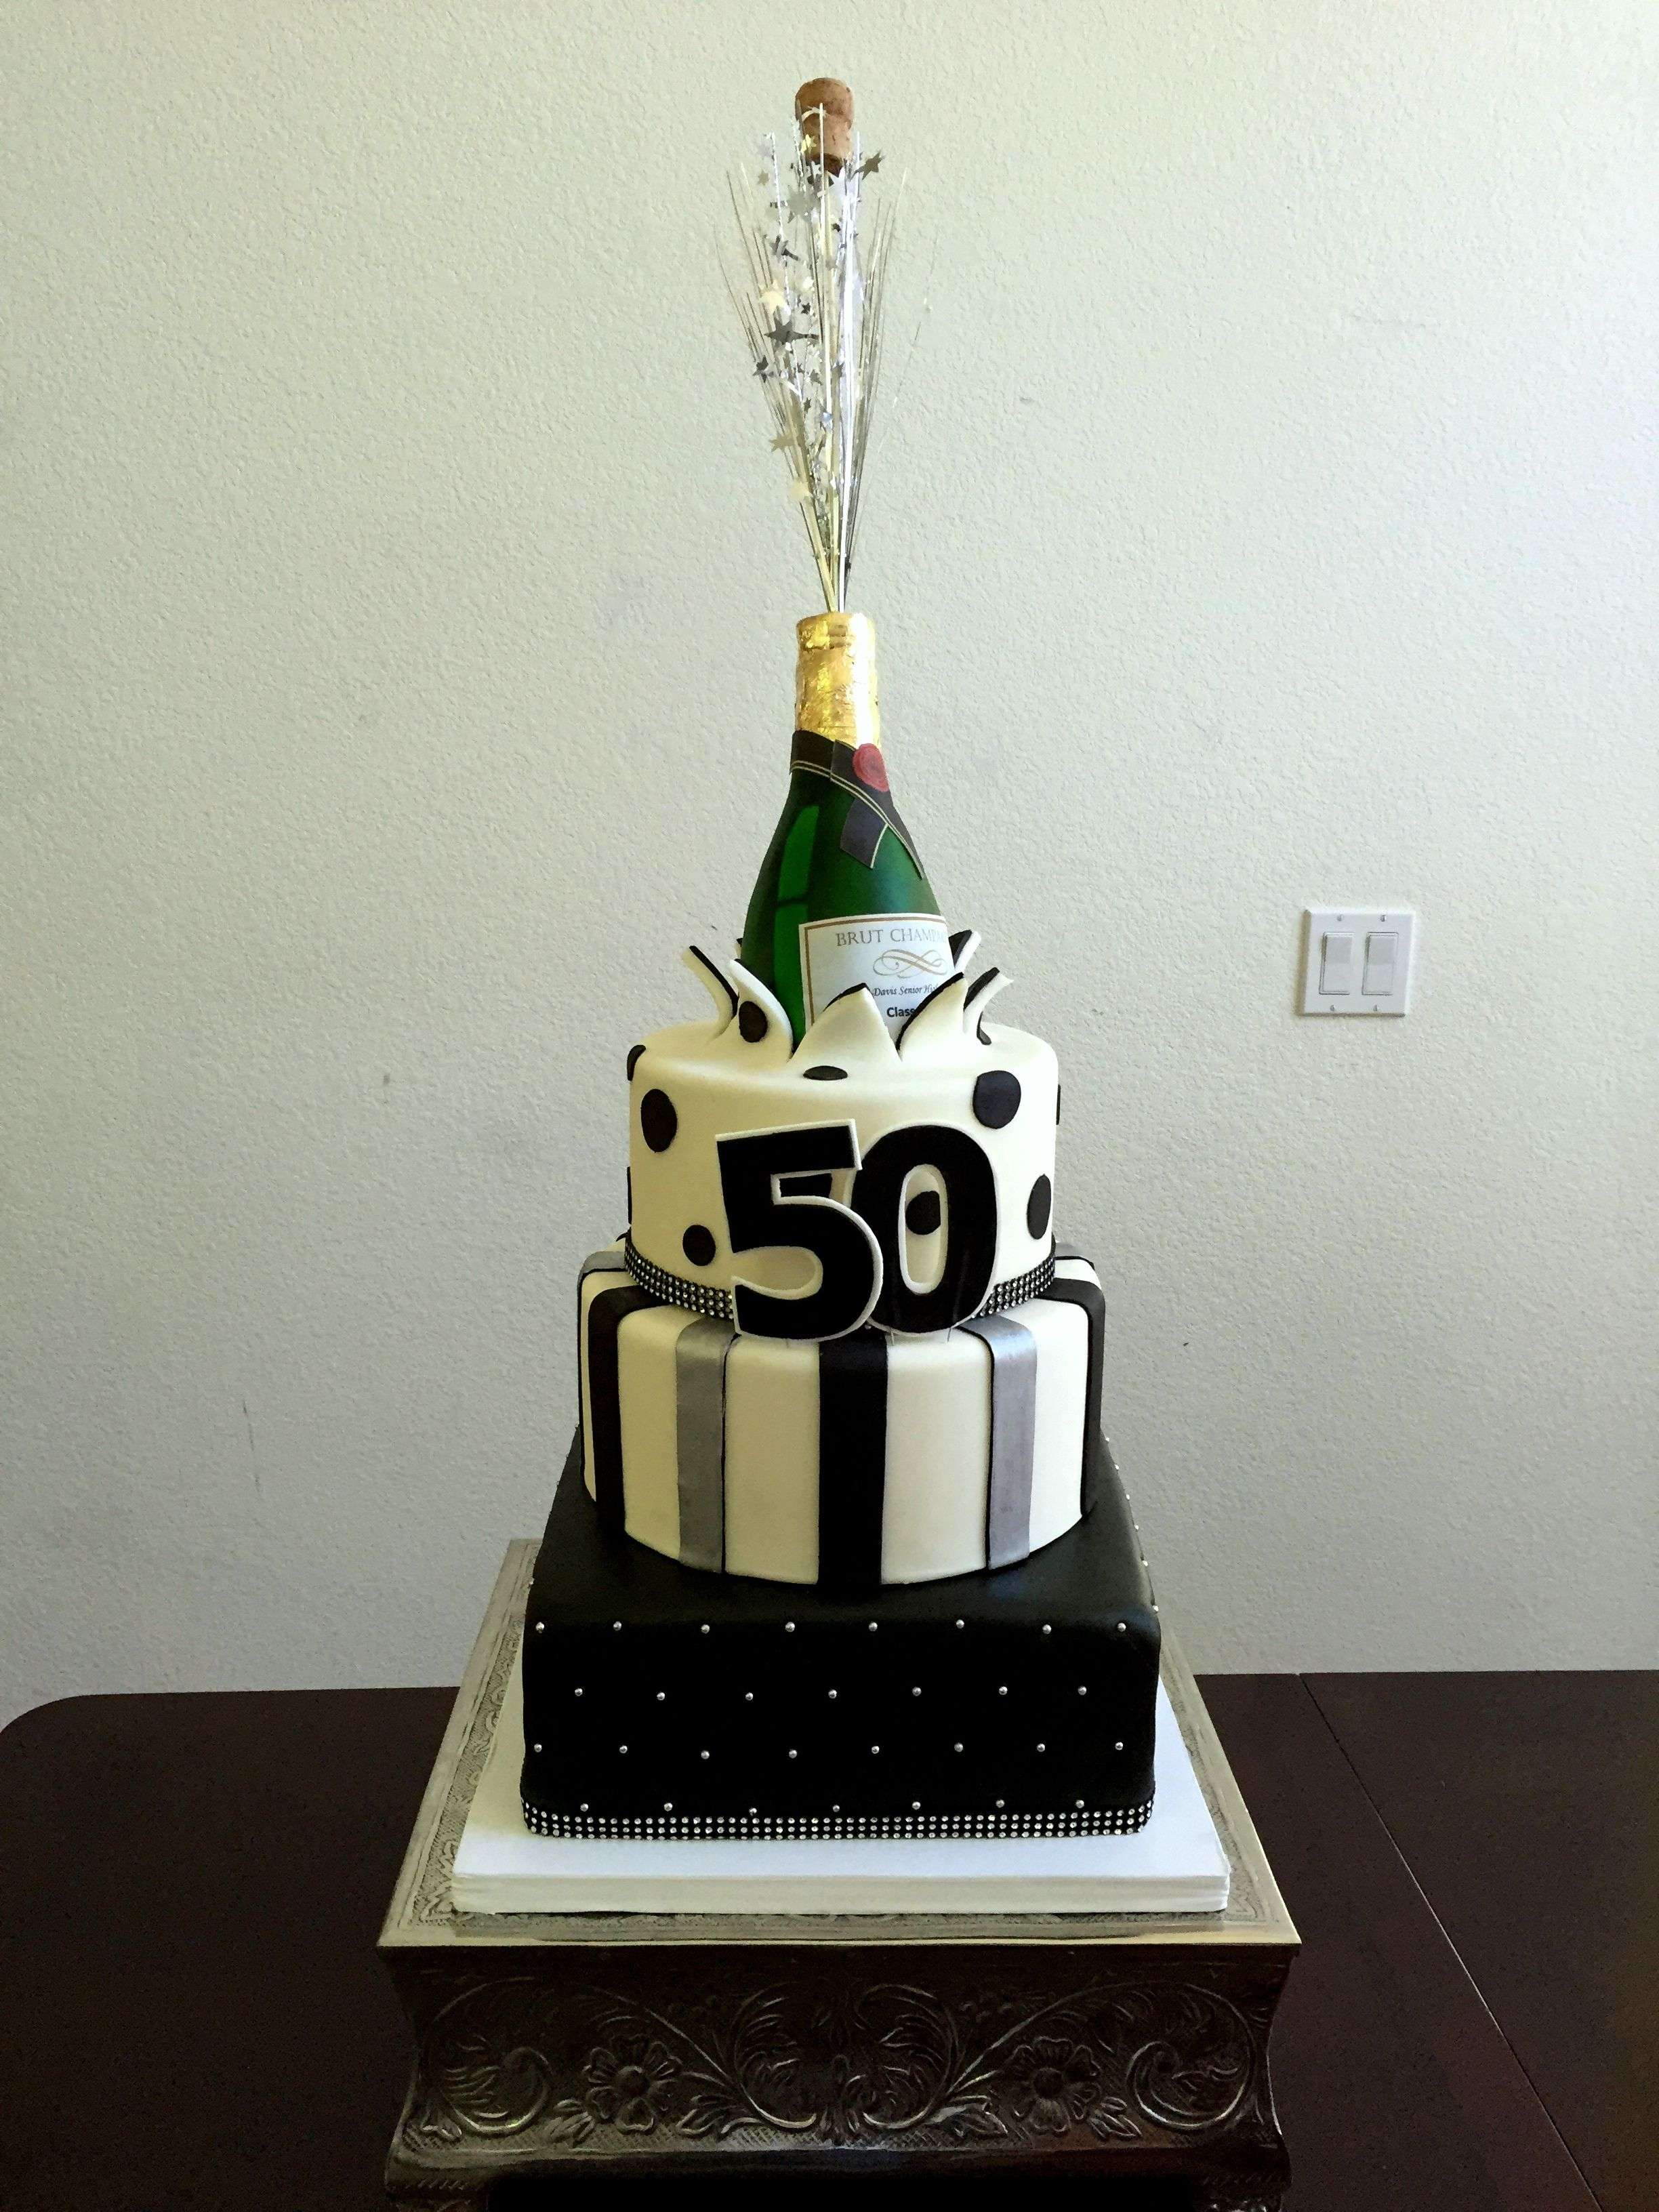 Exploding Champagne Bottle Cake